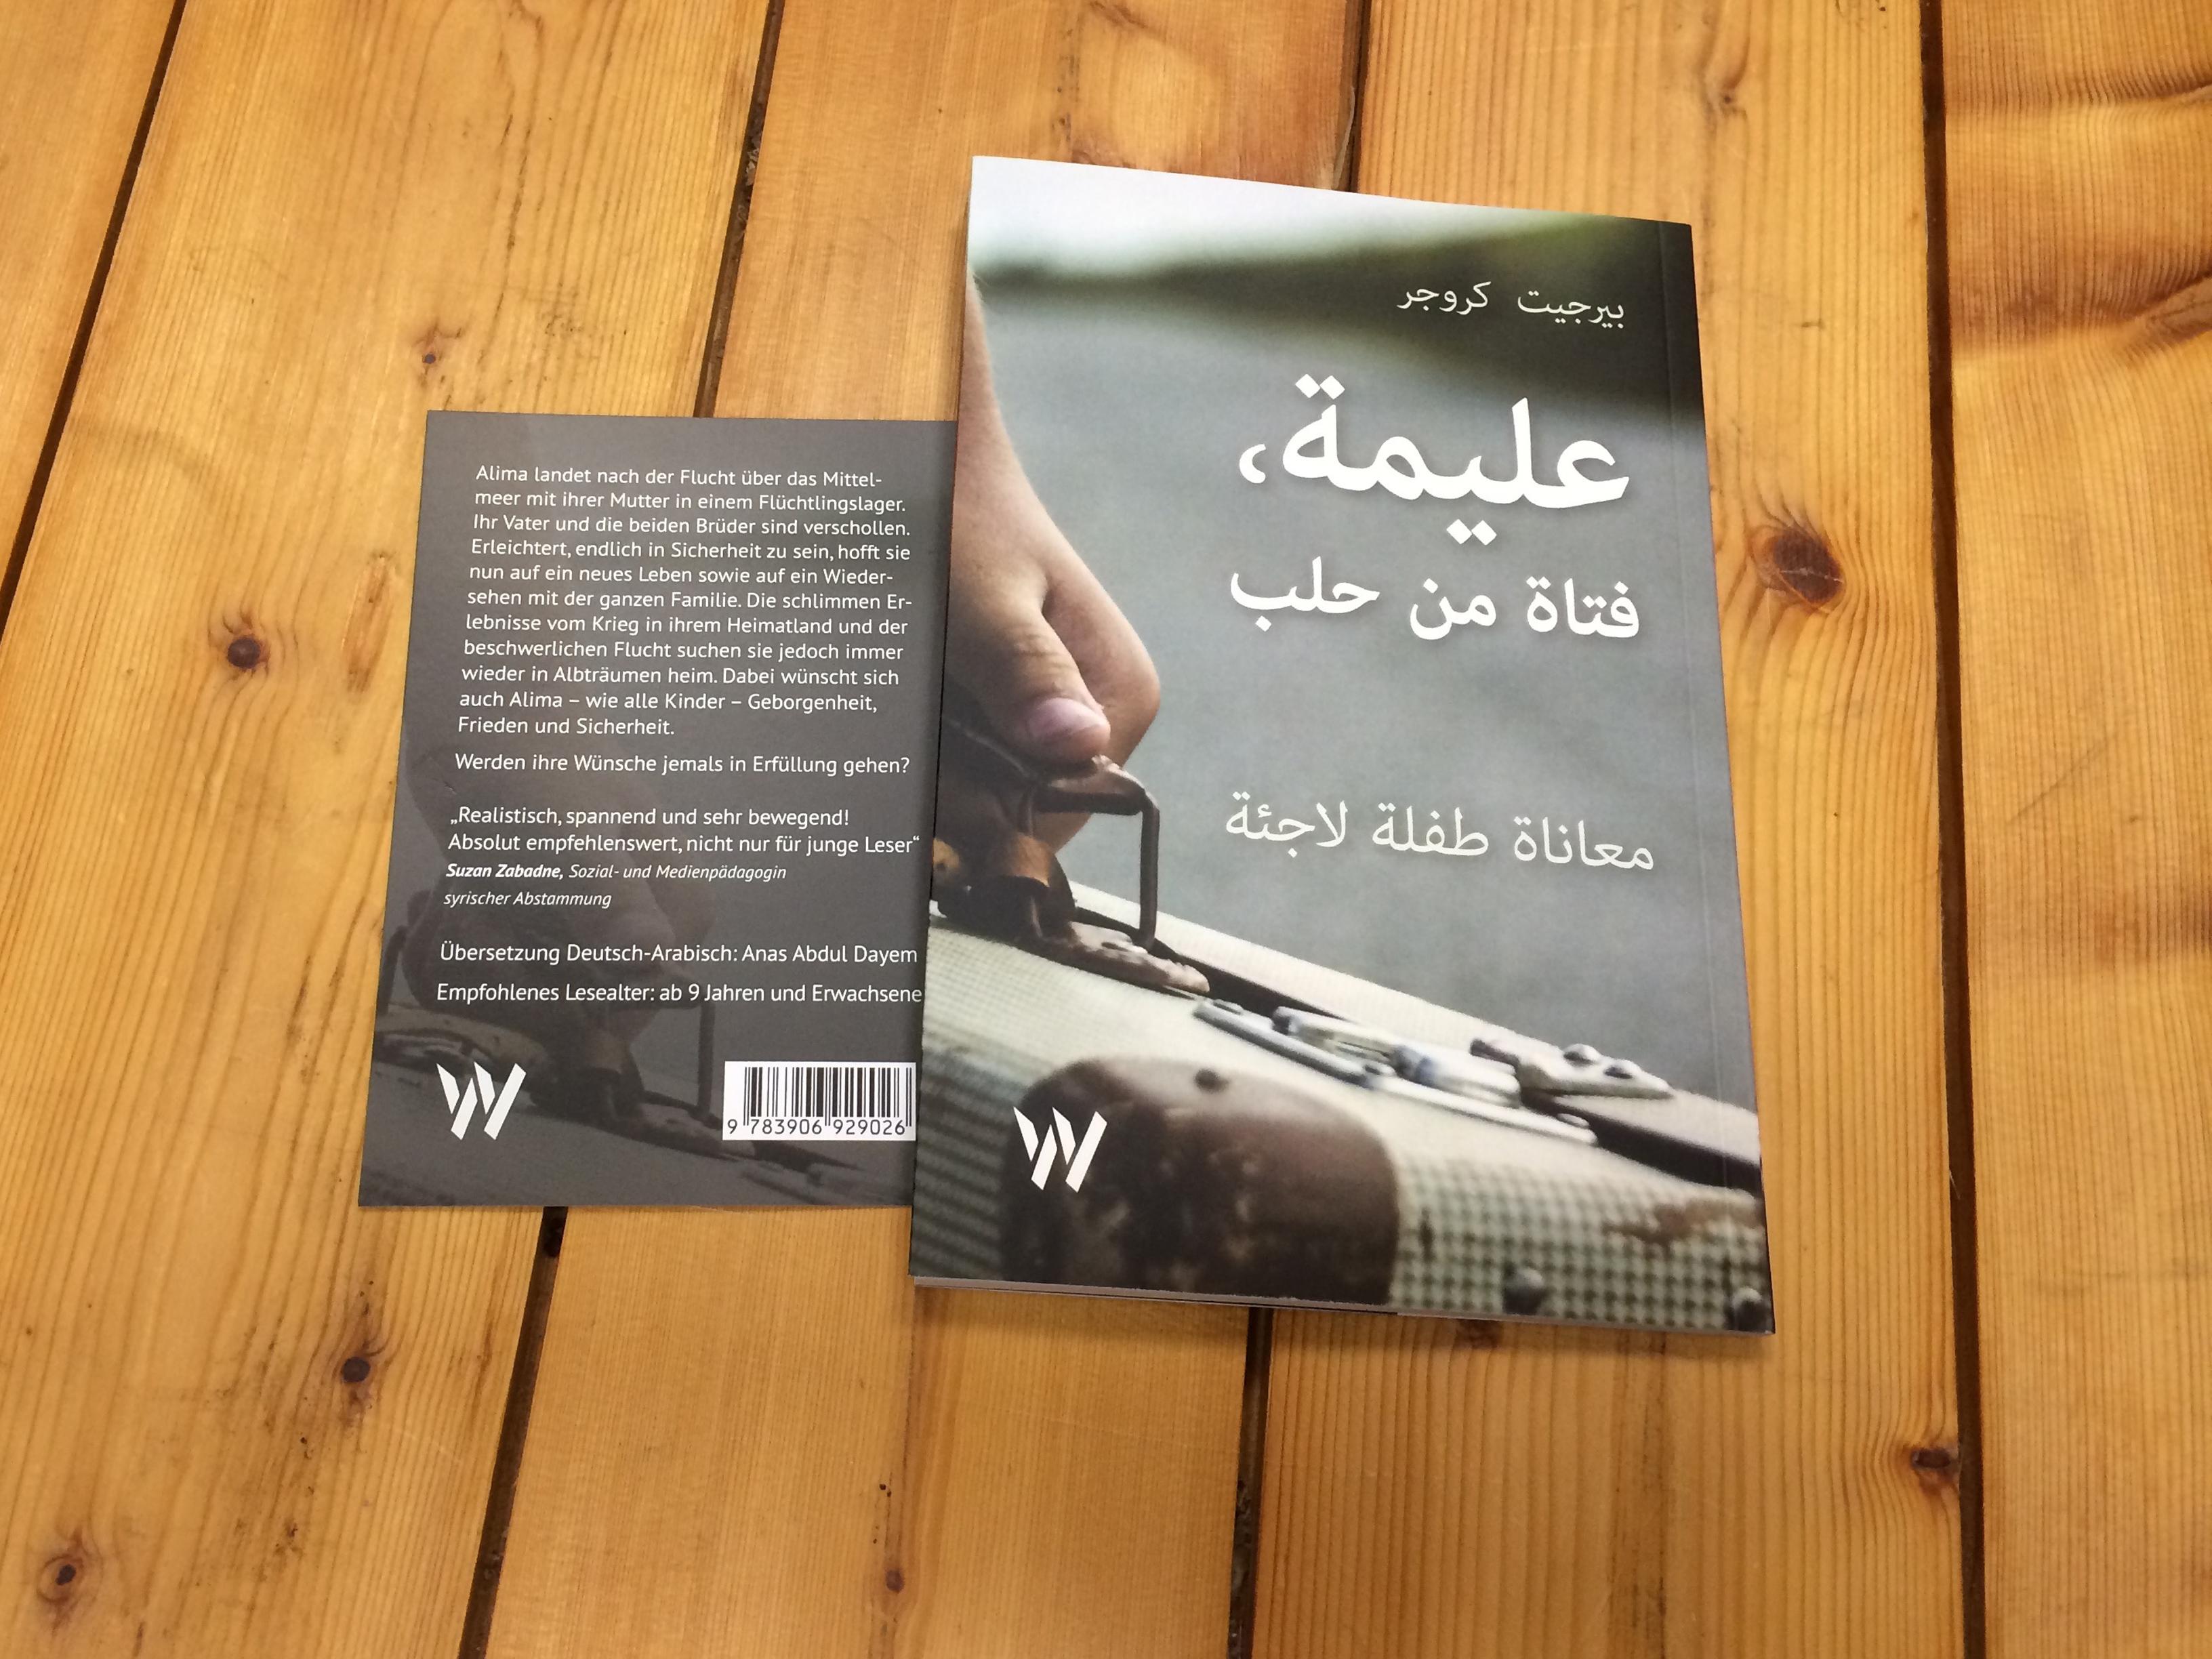 Buch_Alima-Das_Maedchen_aus_Aleppo-Cover-2